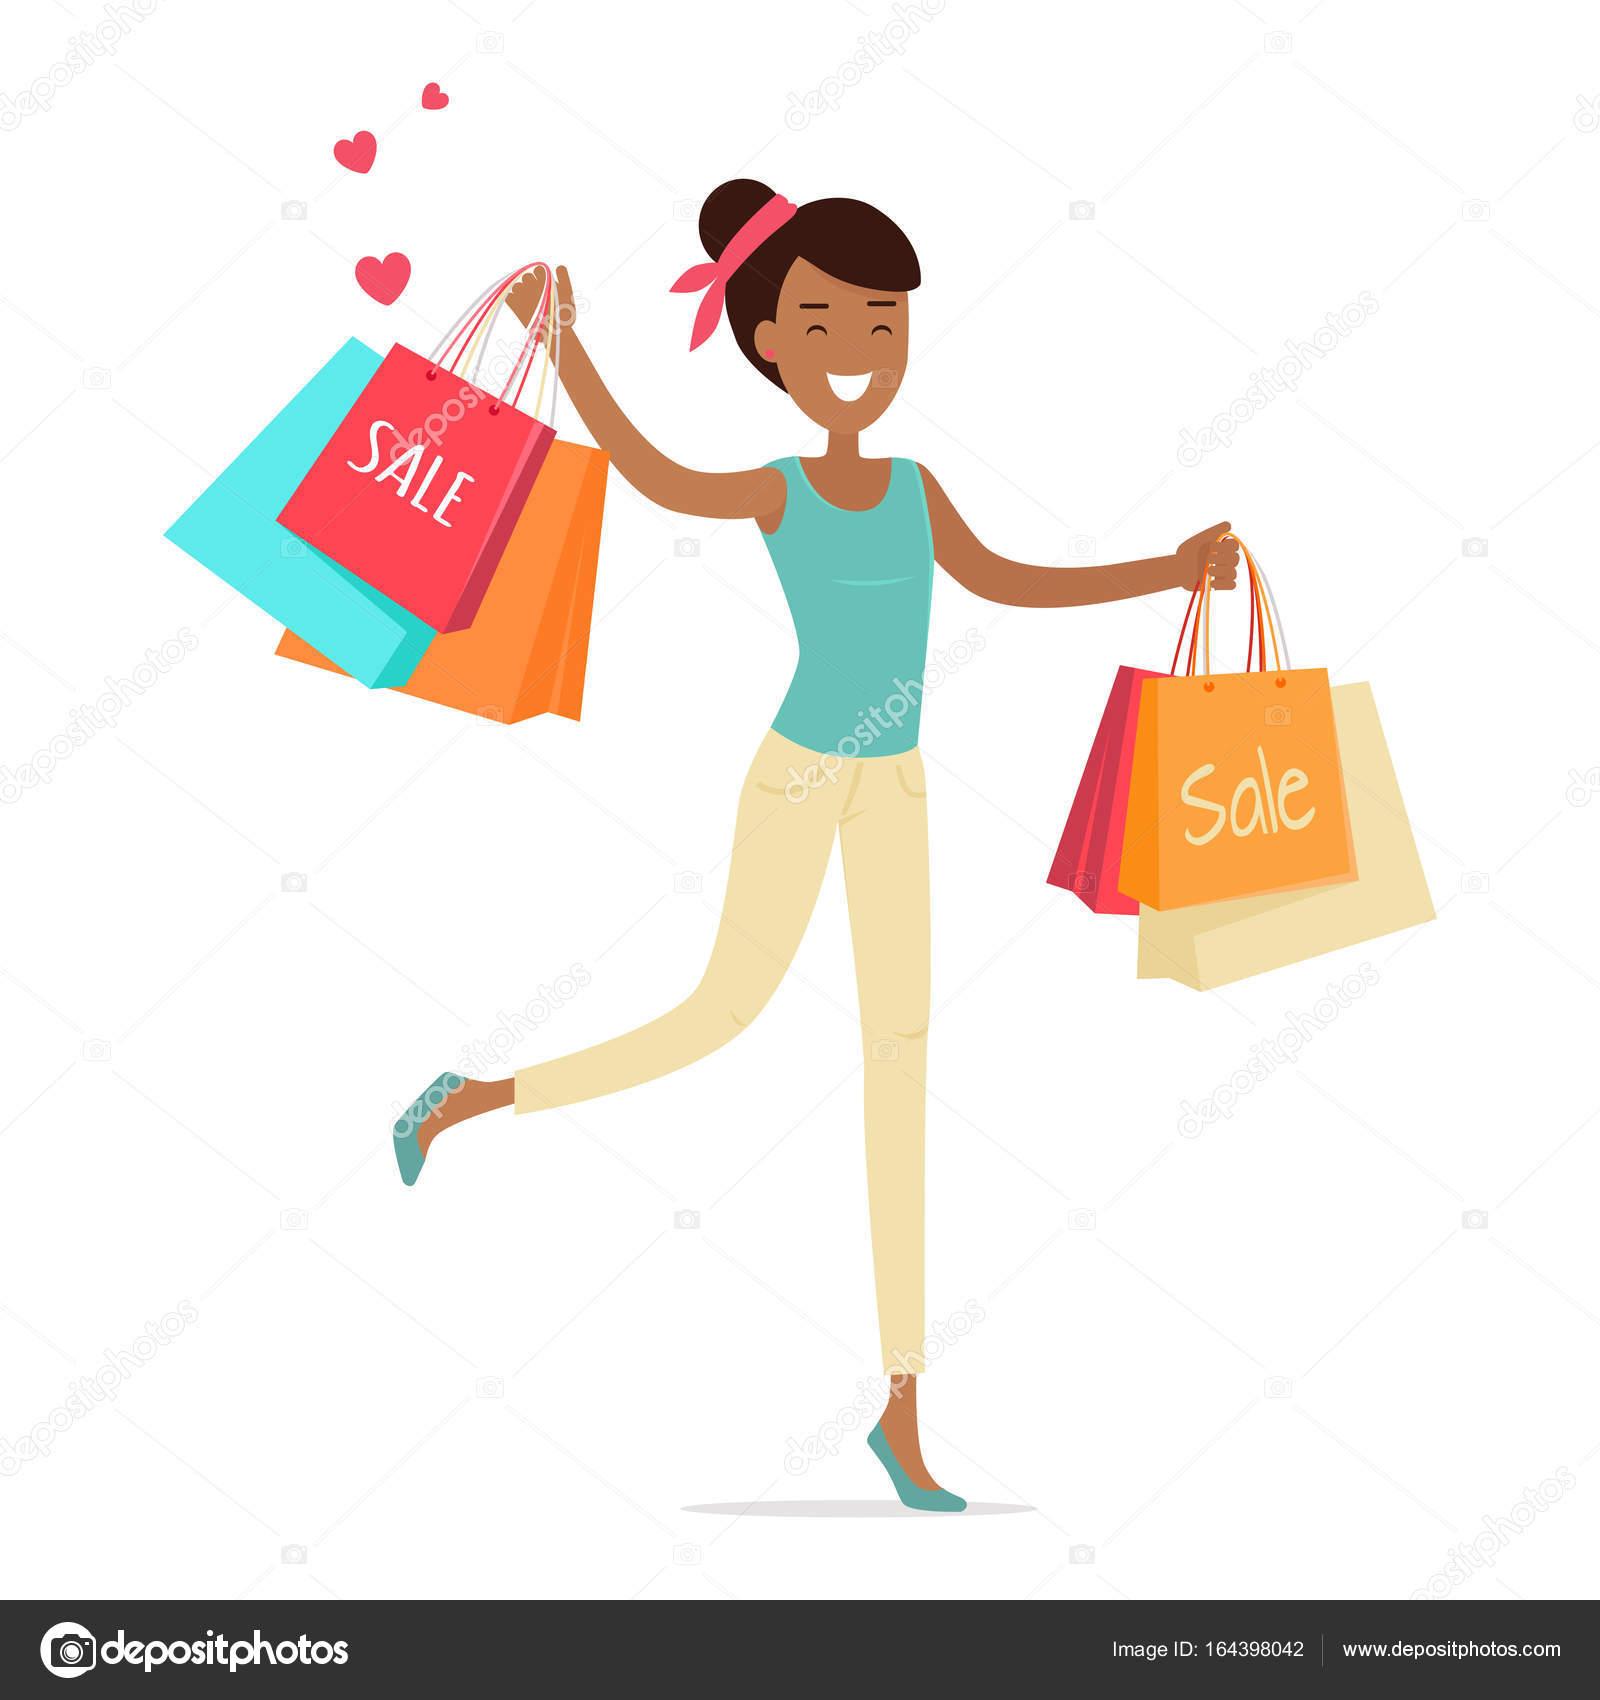 f2aff05bfd79 Πώληση στο κατάστημα Γυναικεία ρούχα. Χαμογελαστή κυρία χορό με ψώνια χαρτί  σακούλες στα χέρια επίπεδη διανυσματικά εικονογράφηση σε άσπρο φόντο.